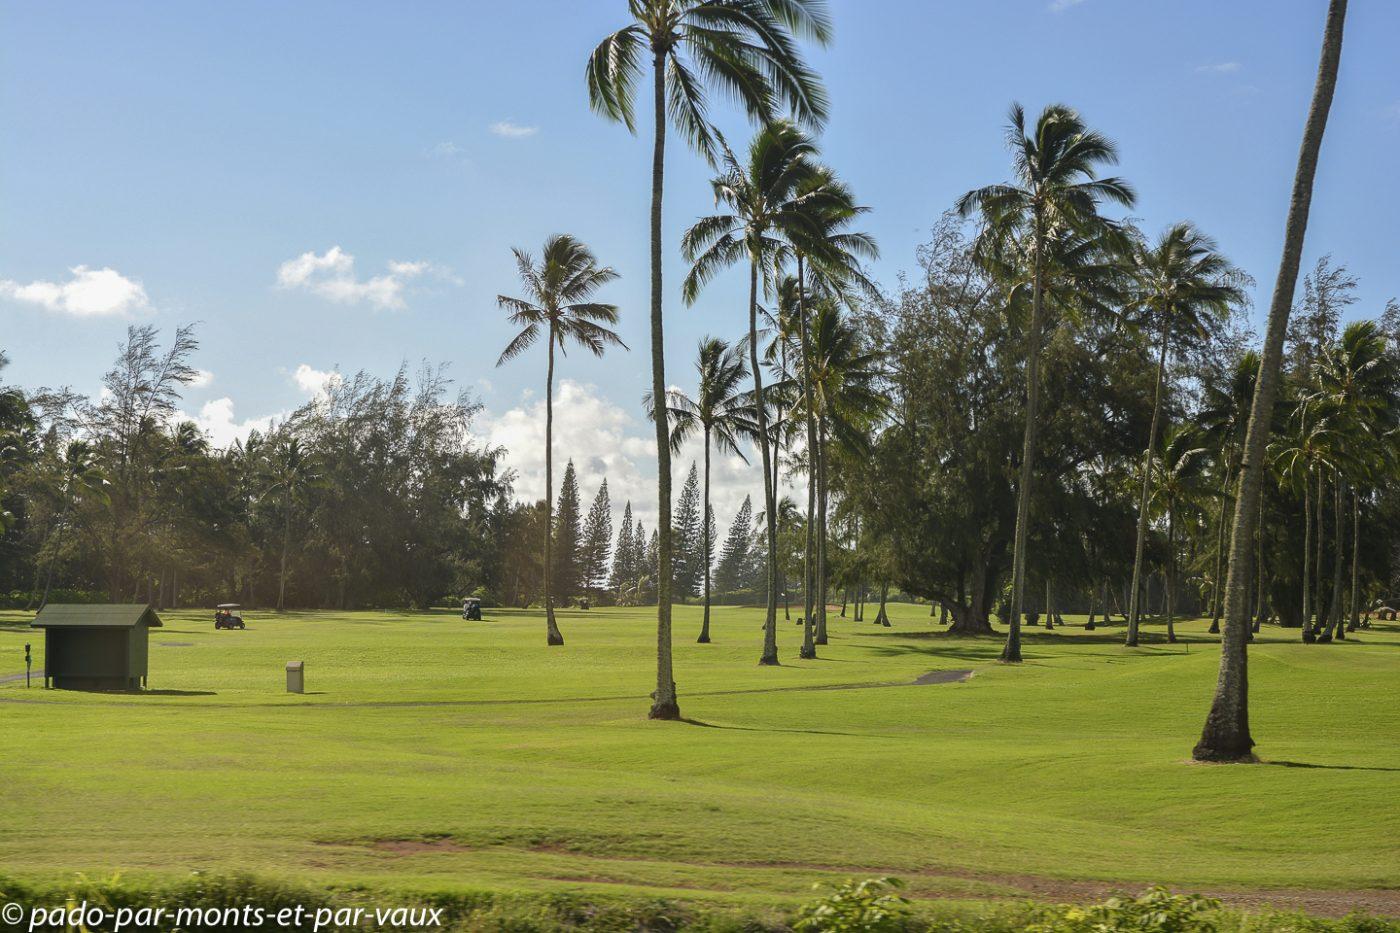 Kauai - golf